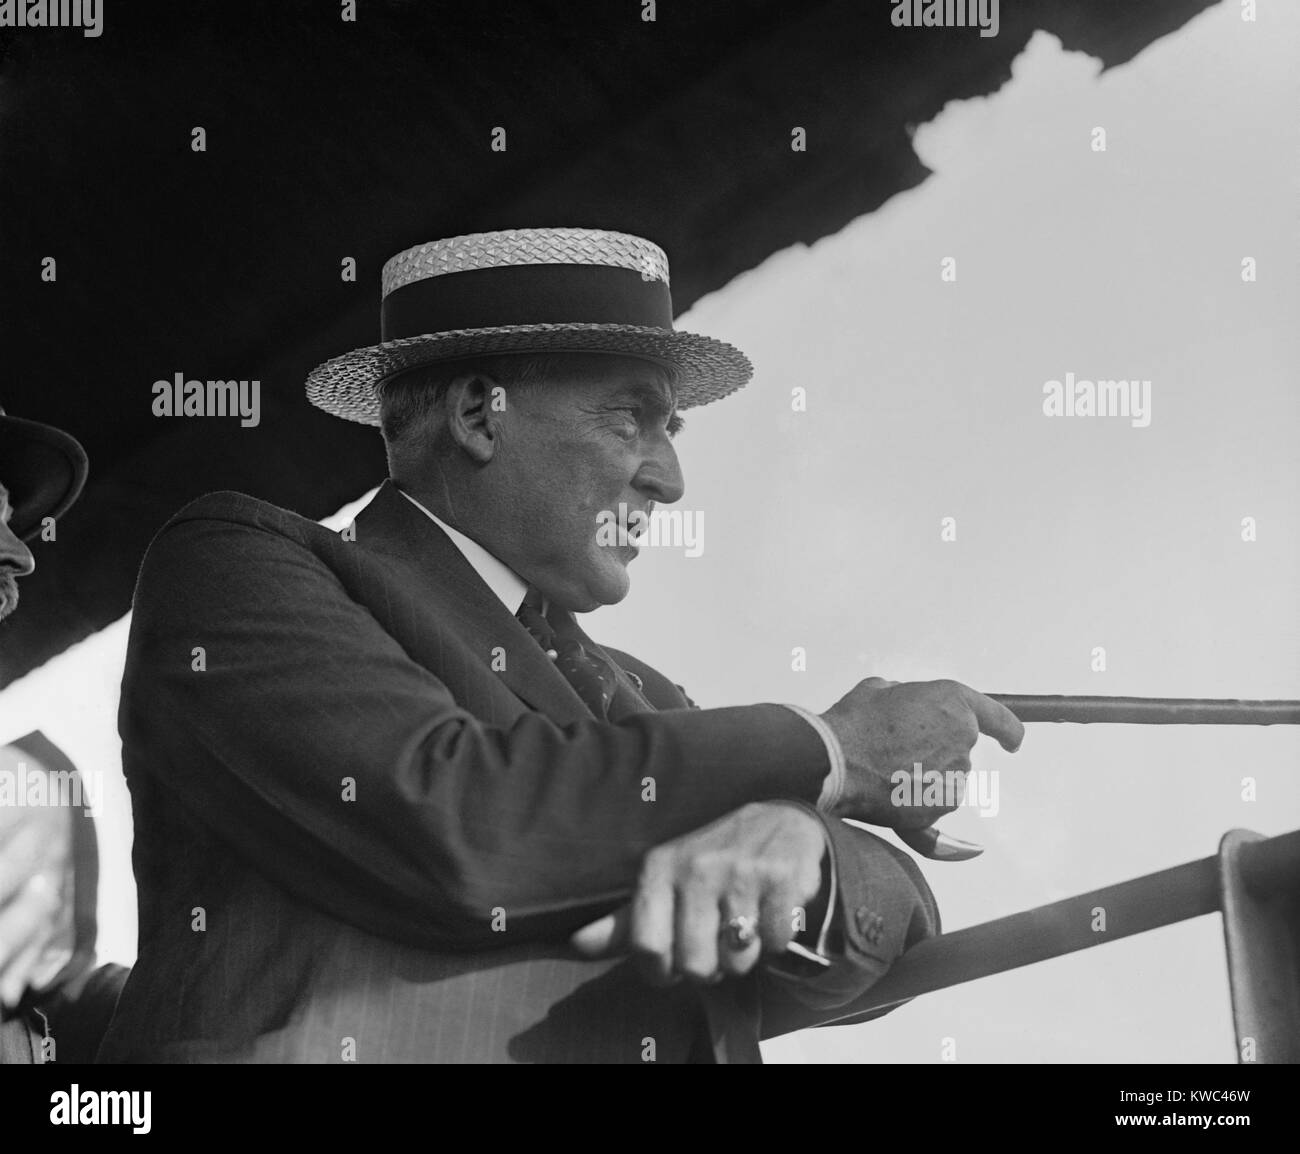 President Warren Harding at Gettysburg Battlefield, July 1, 1922. He watched 5,500 U.S. Marines reenact Pickett's - Stock Image